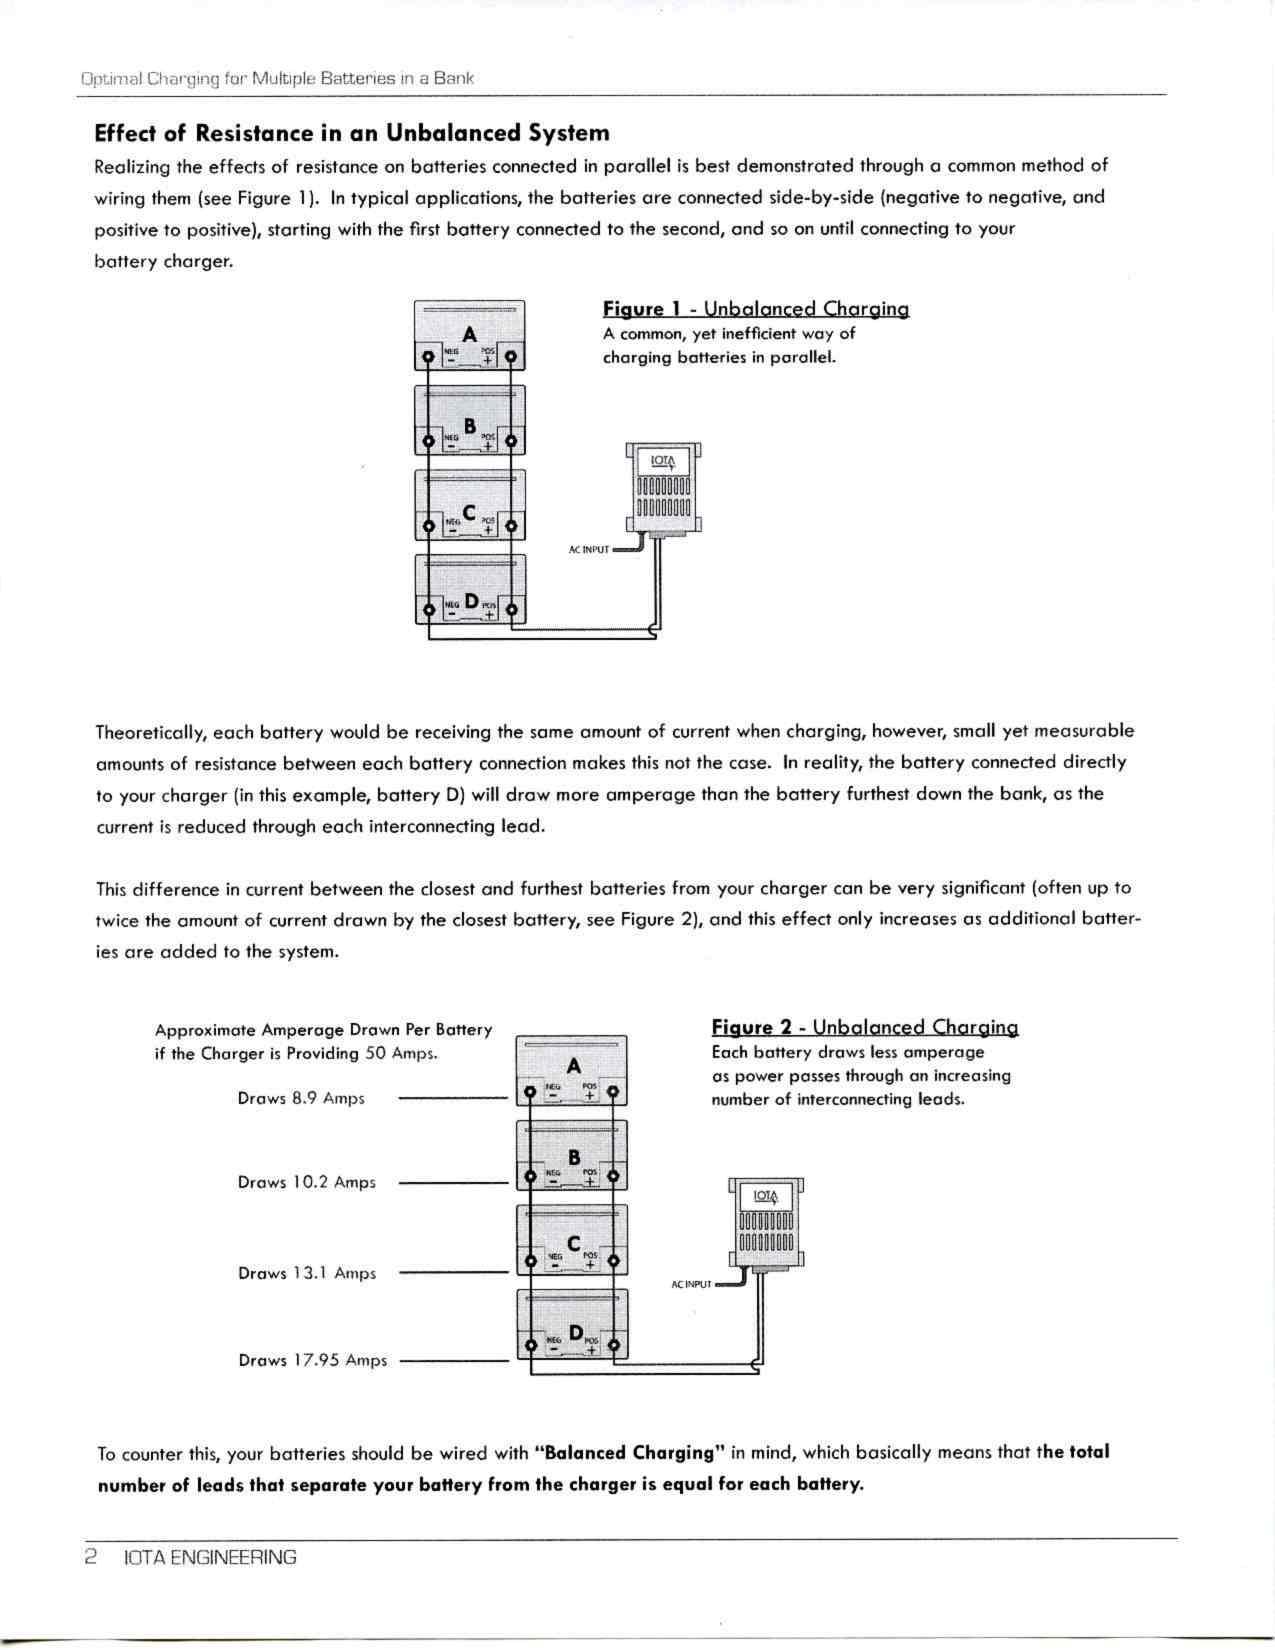 iota i320 emergency ballast wiring diagram 2009 jeep jk radio 13 balanced battery charging and dis by